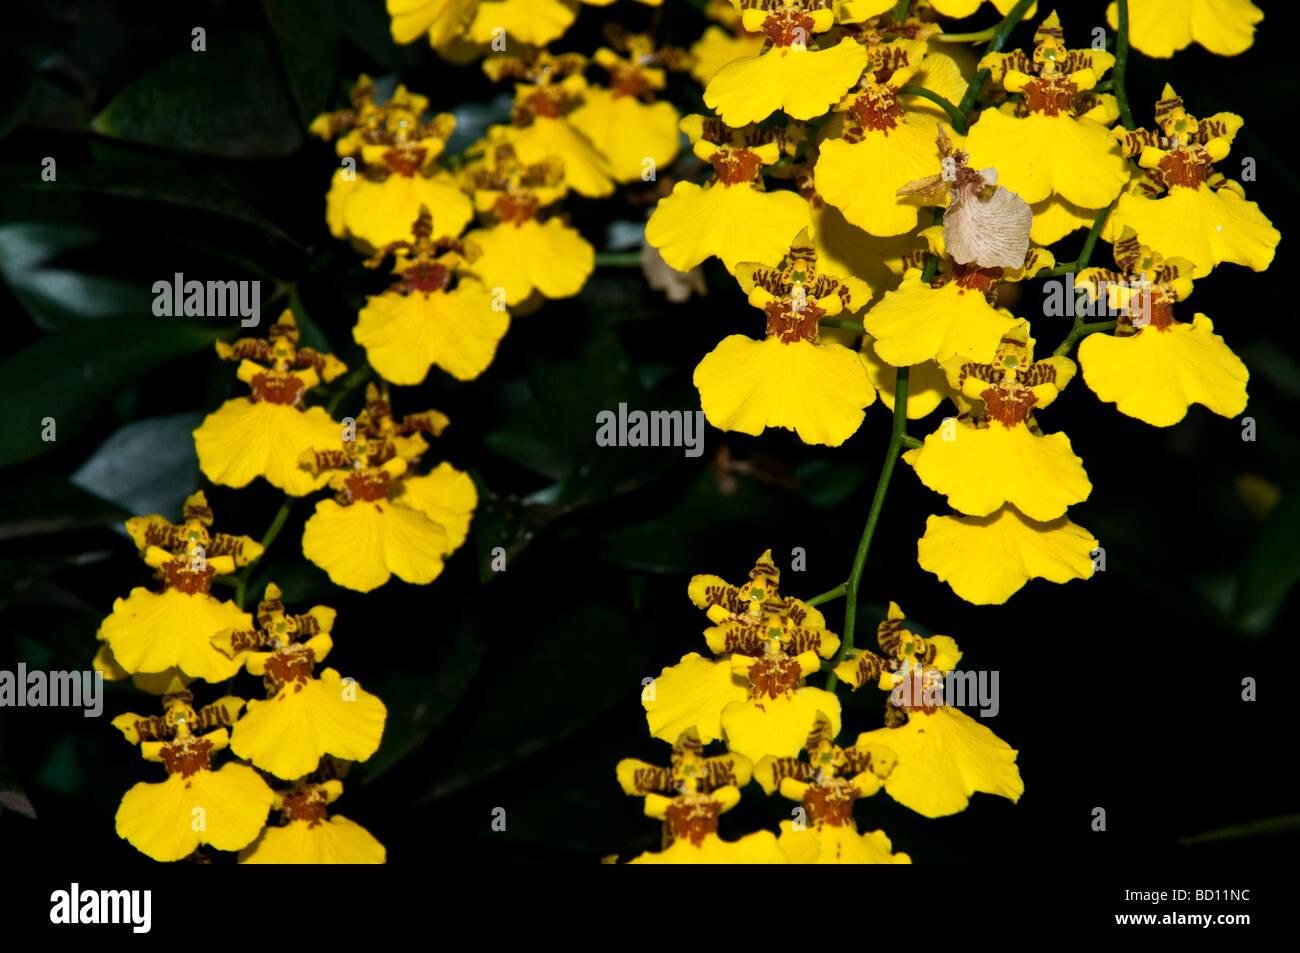 Dancing Ladies Orchids, Oncidium, Gower Ramsey, Orchidaceae - Stock Image